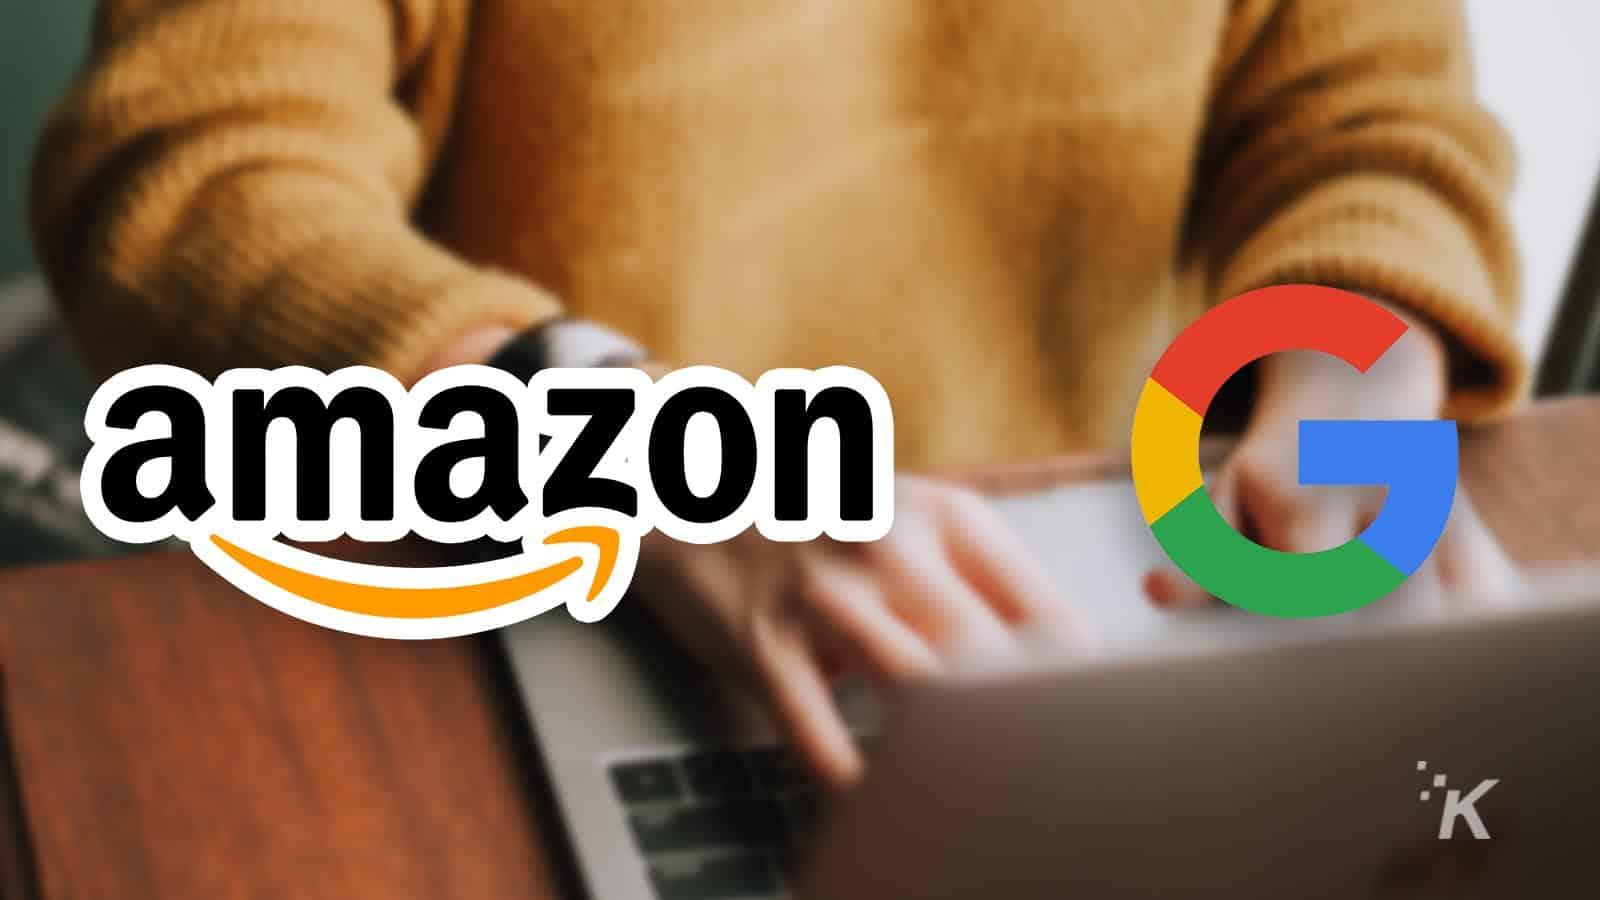 amazon and google logos on blurred background